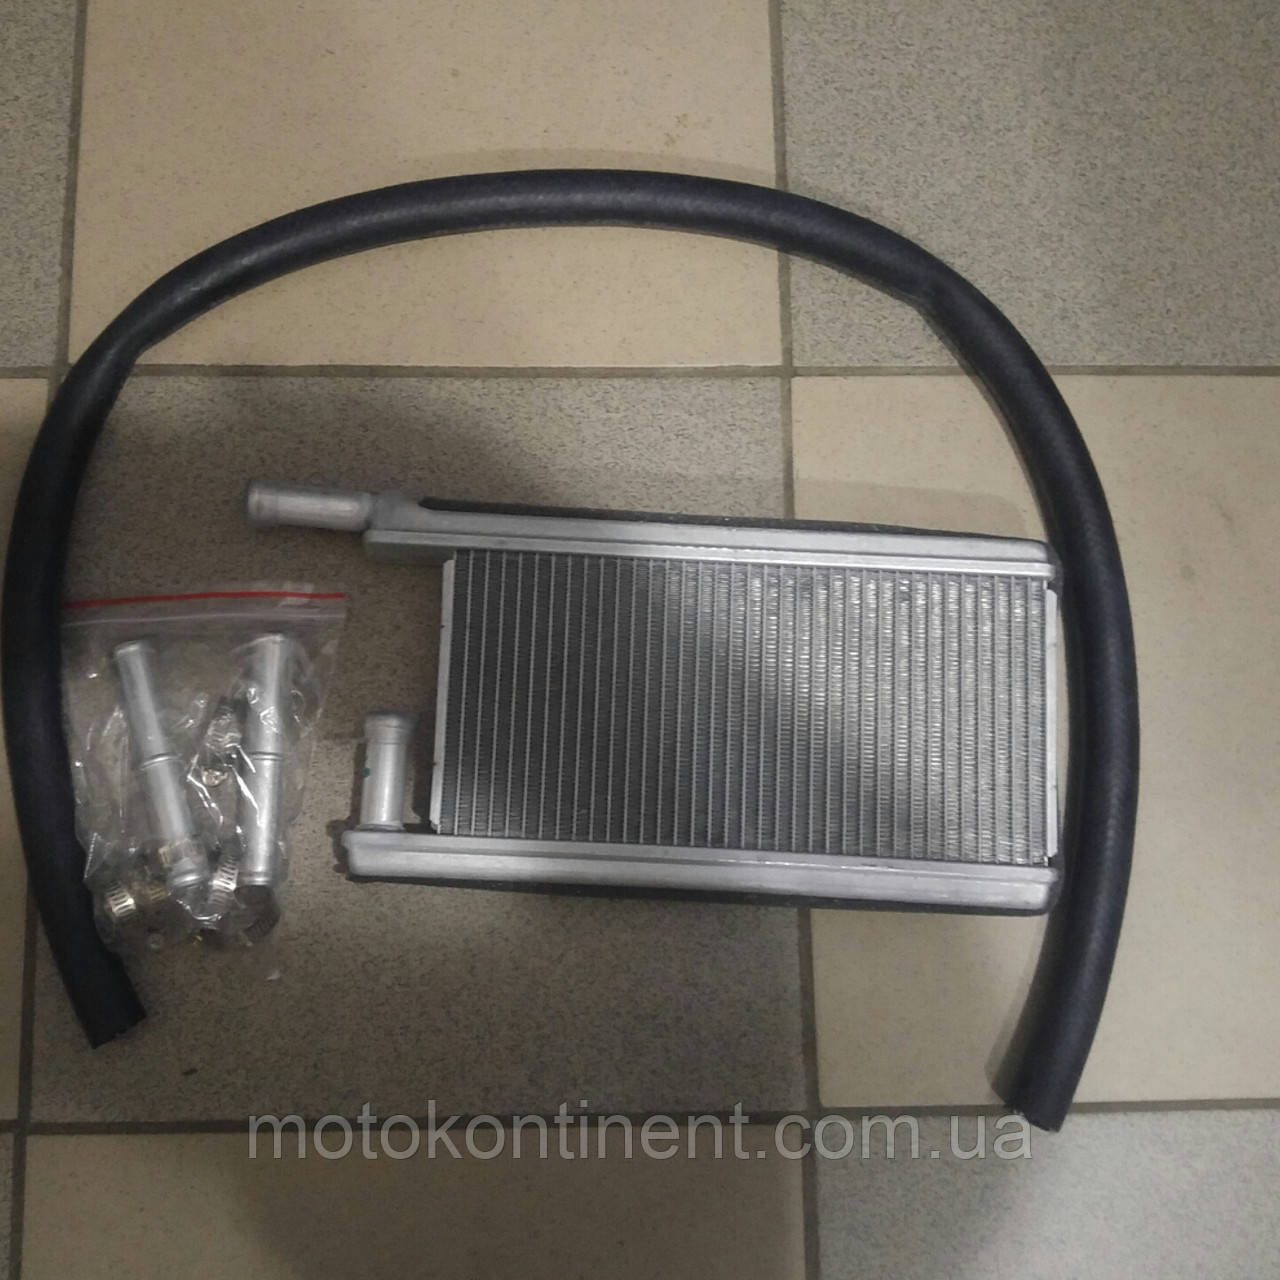 7801A382 Радиатор отопителя (печьки) Mitsubishi L200/ Pajero Sport